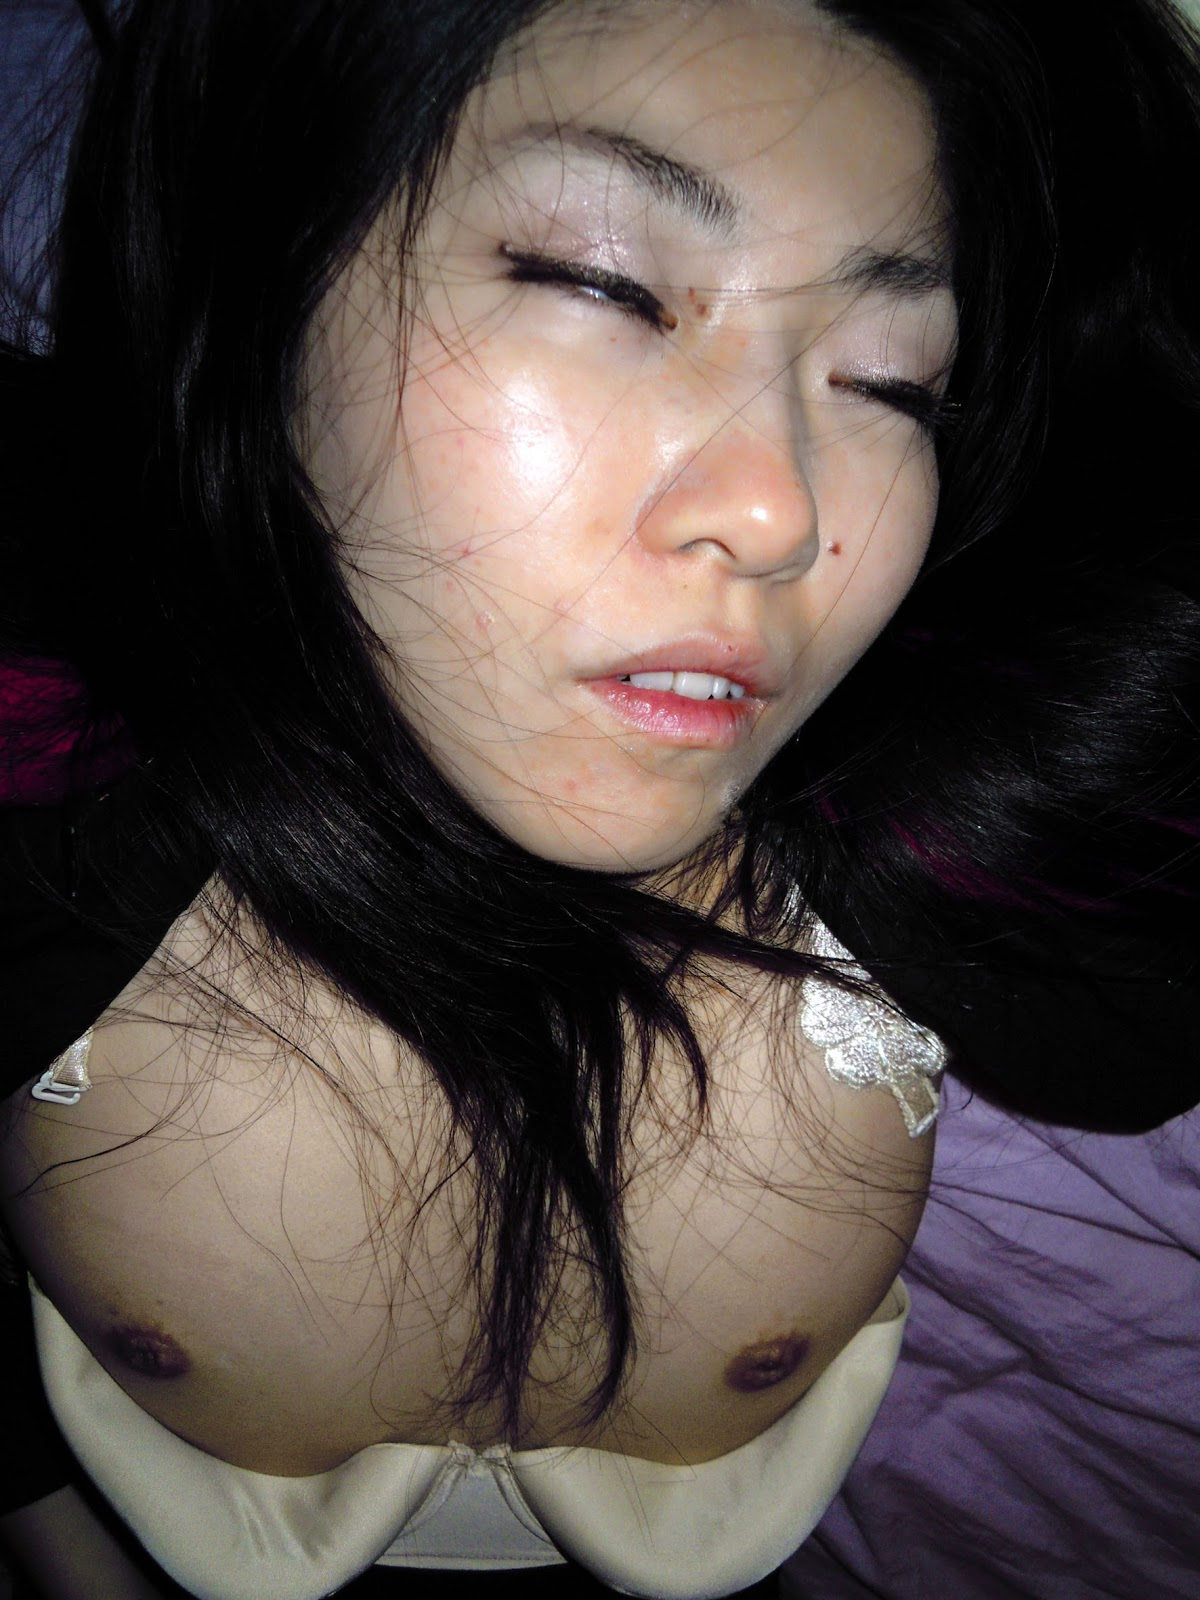 drunk girlfriend |sexmenu free amateur asian girls photo videos